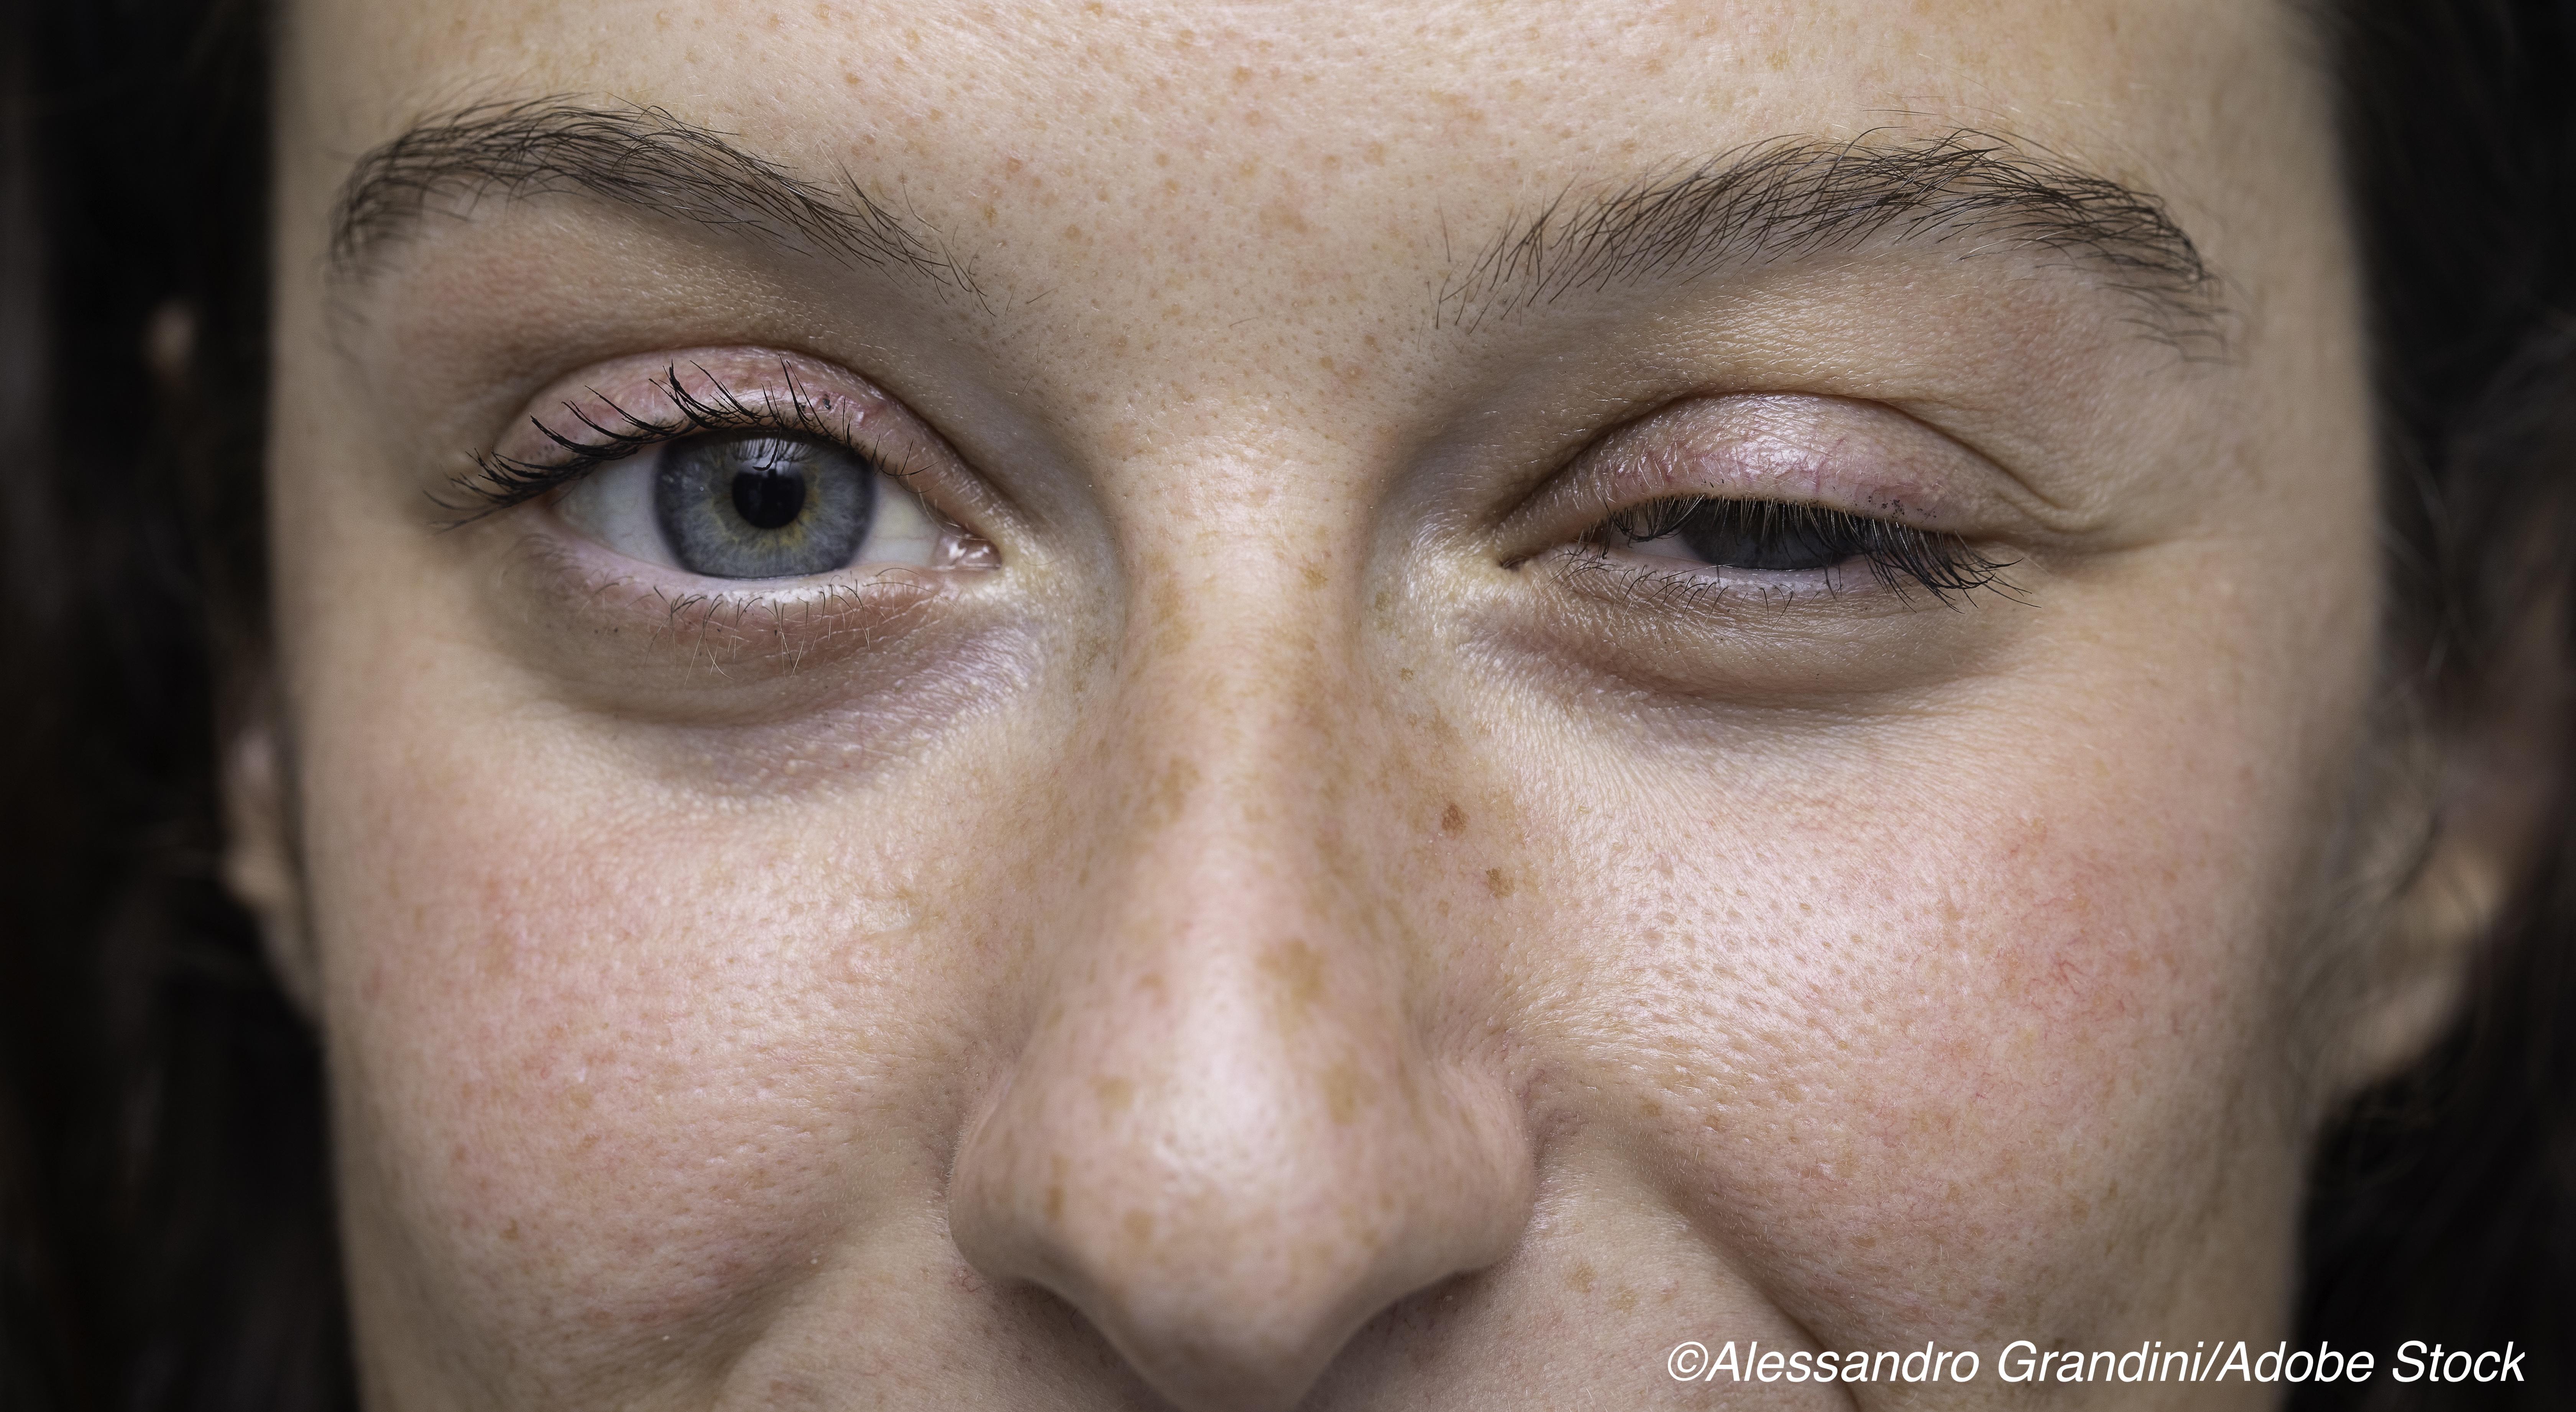 Diagnosing Ocular Myasthenia Gravis